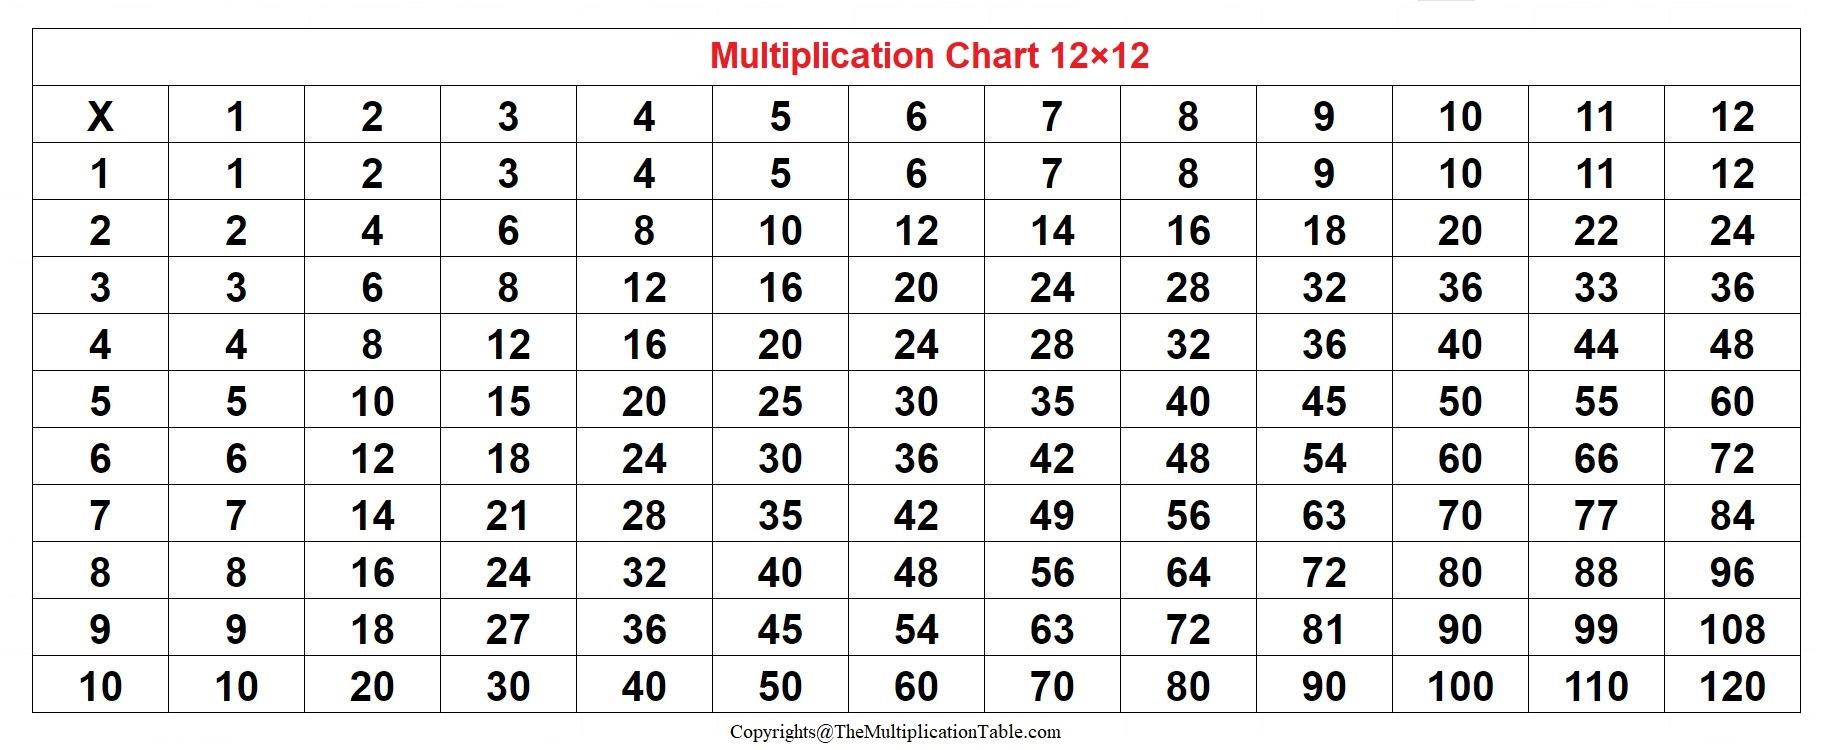 Multiplication Chart 12×12 Printable